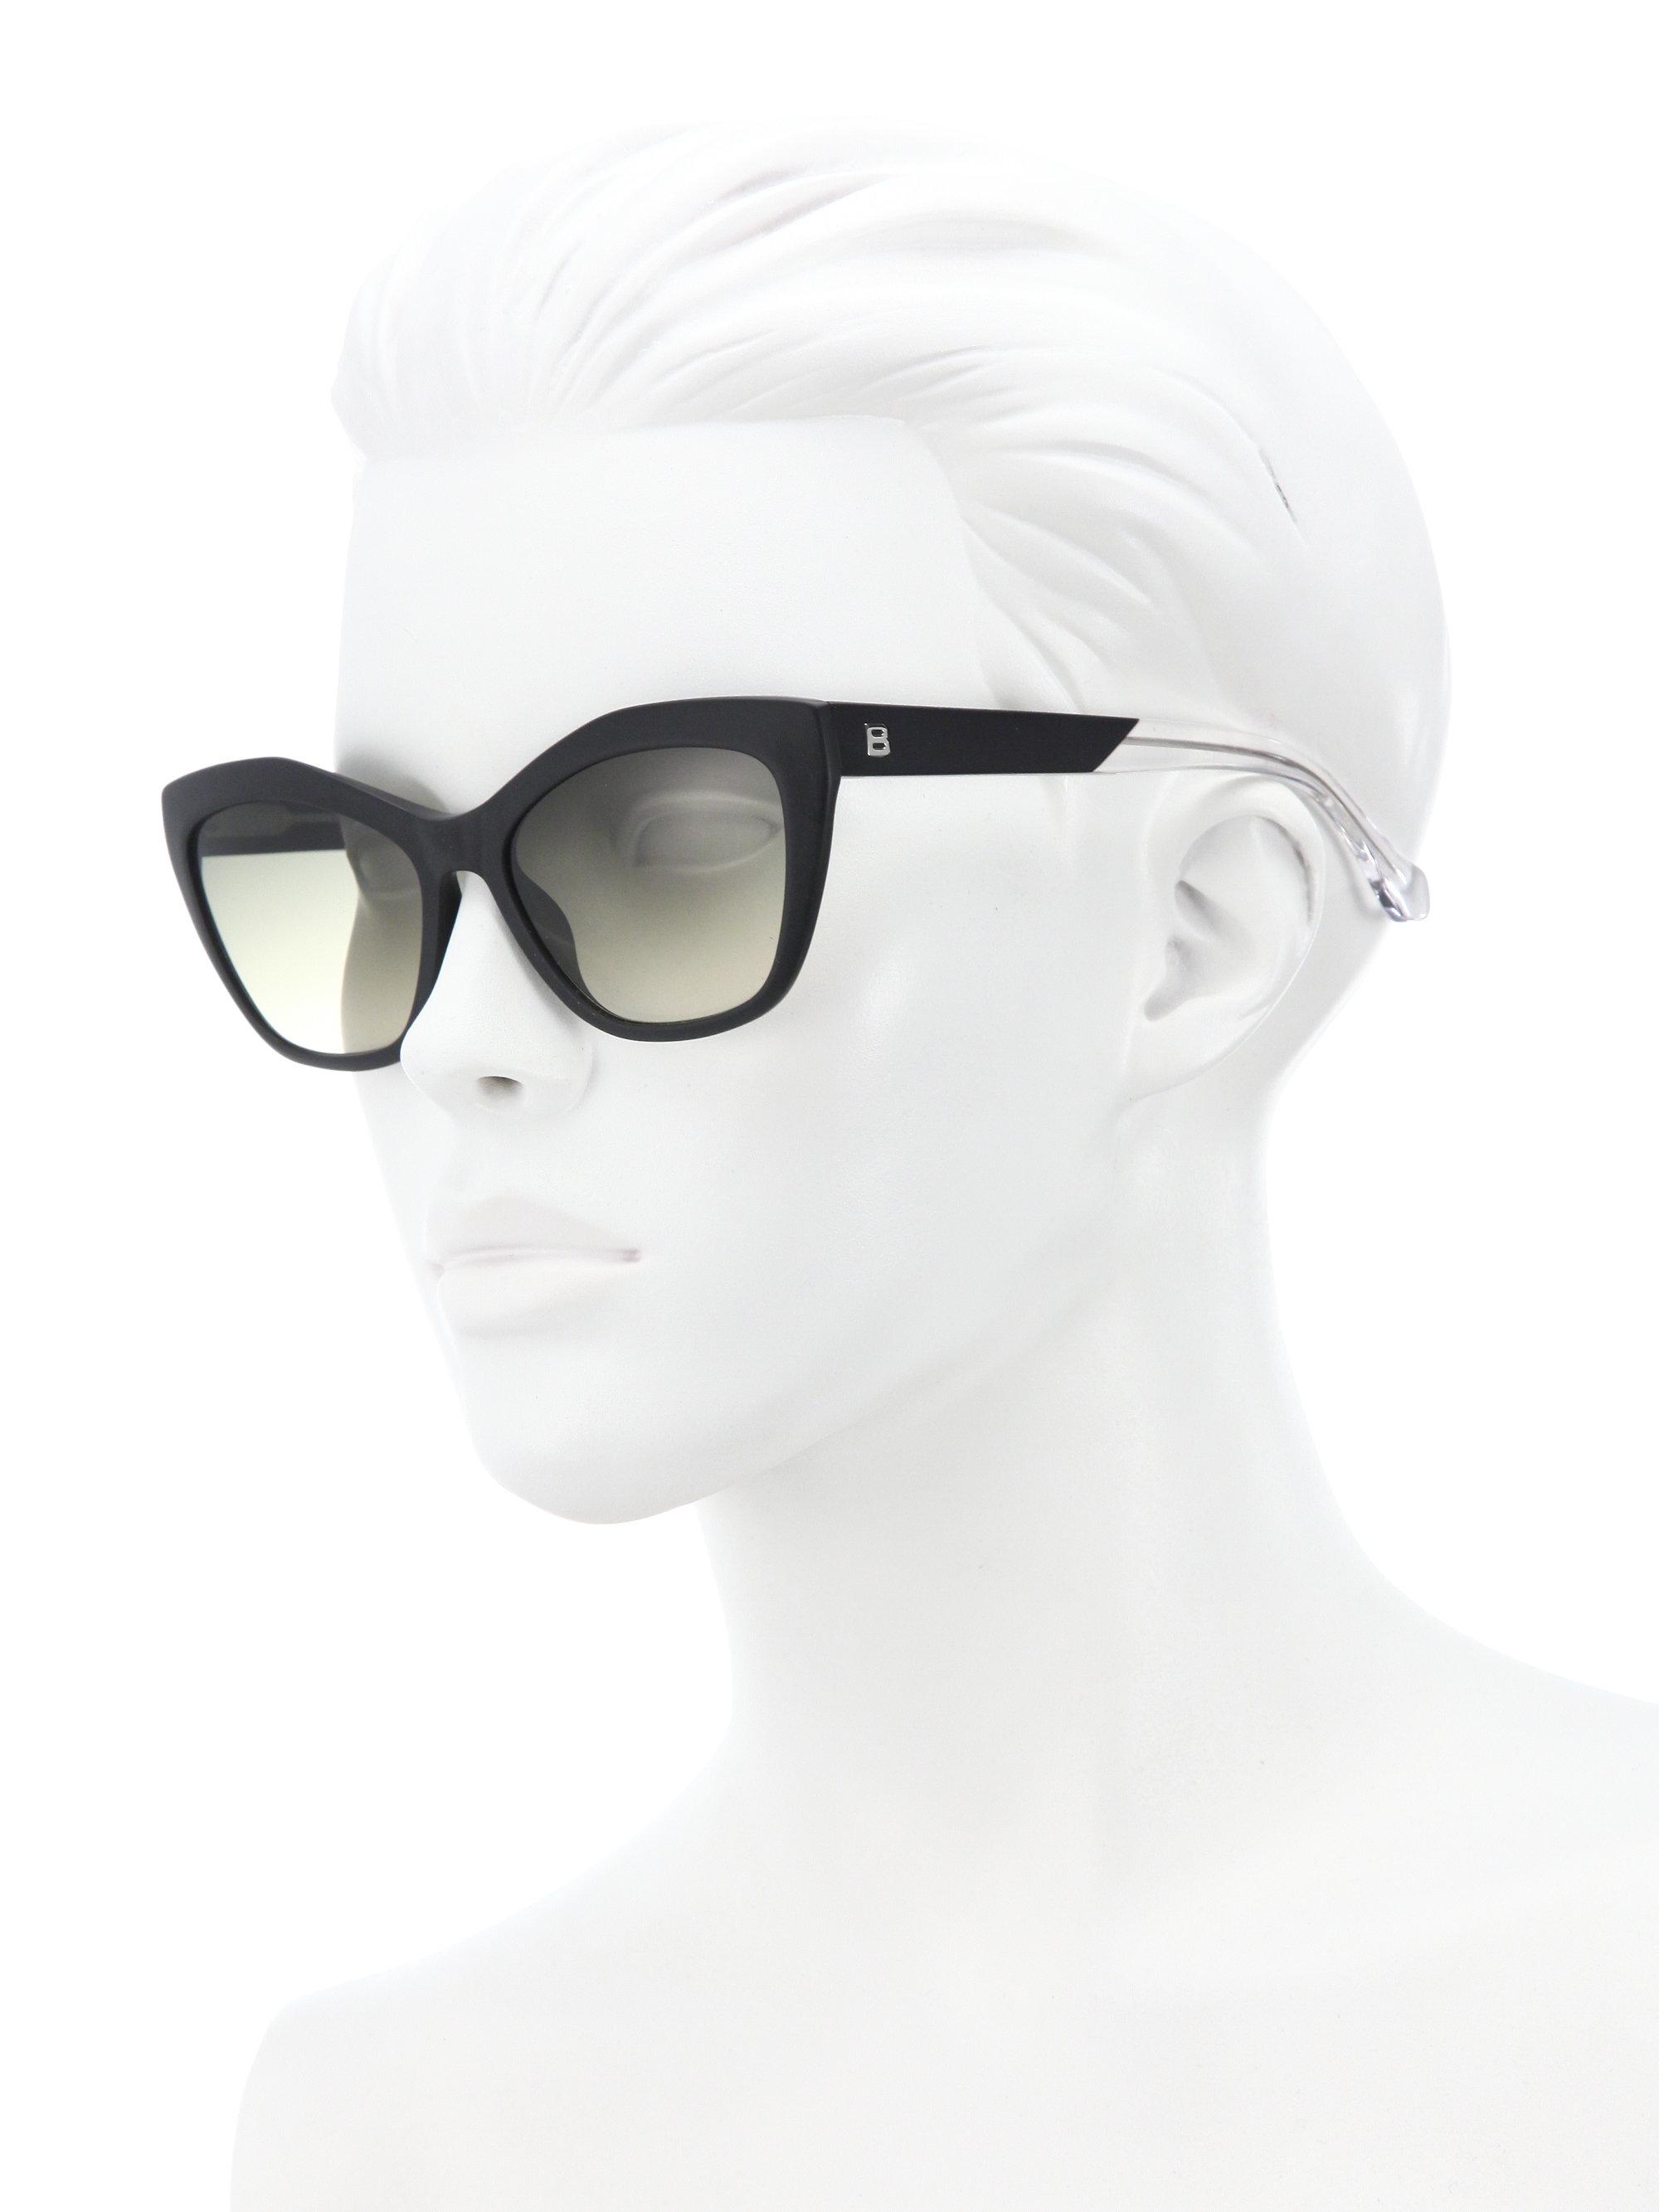 e48e41acba6 Lyst - Balenciaga 56mm Acetate Cat Eye Sunglasses in Black